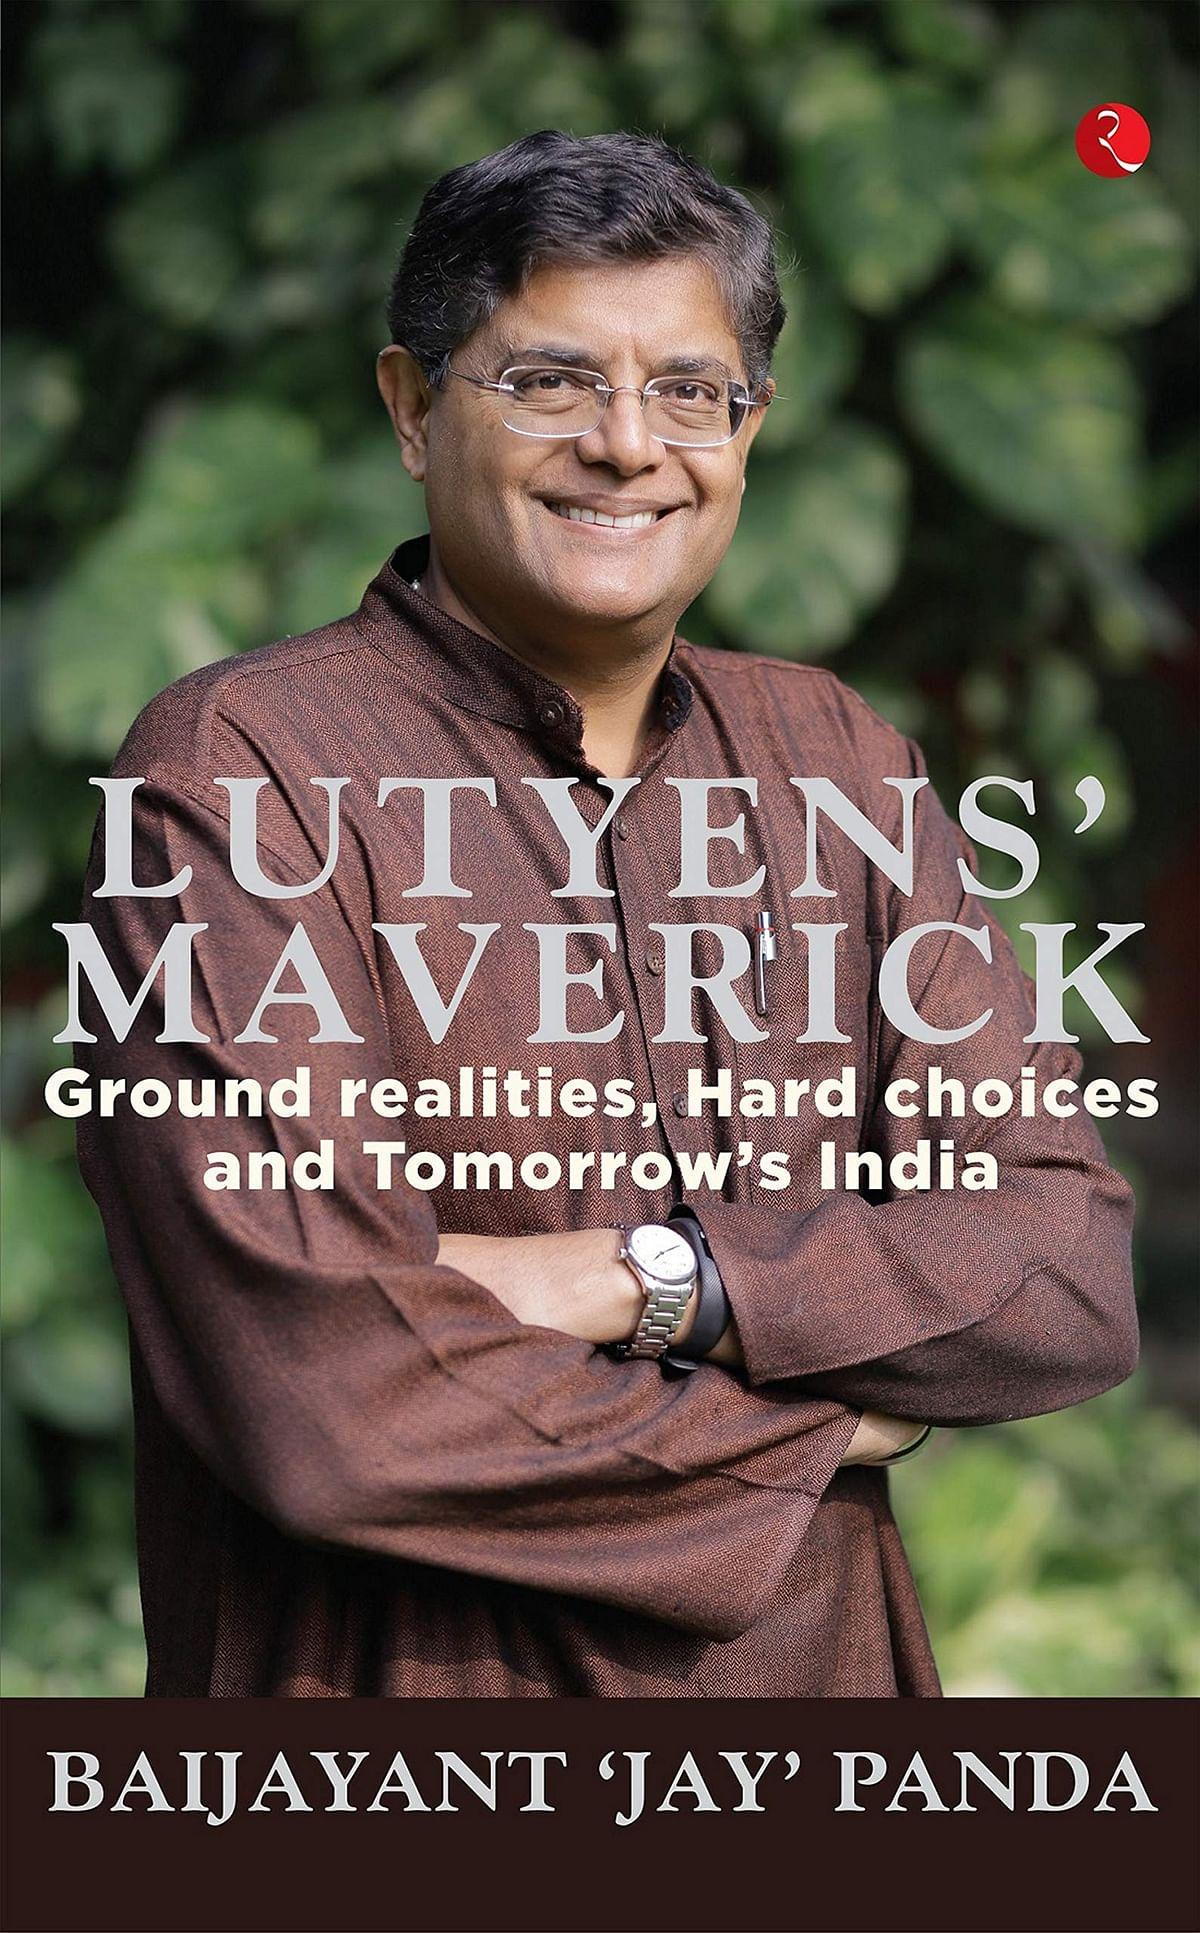 Lutyens' Maverick: Ground Realities, Hard Choices And Tomorrow's India by Baijayant 'Jay' Panda – Review